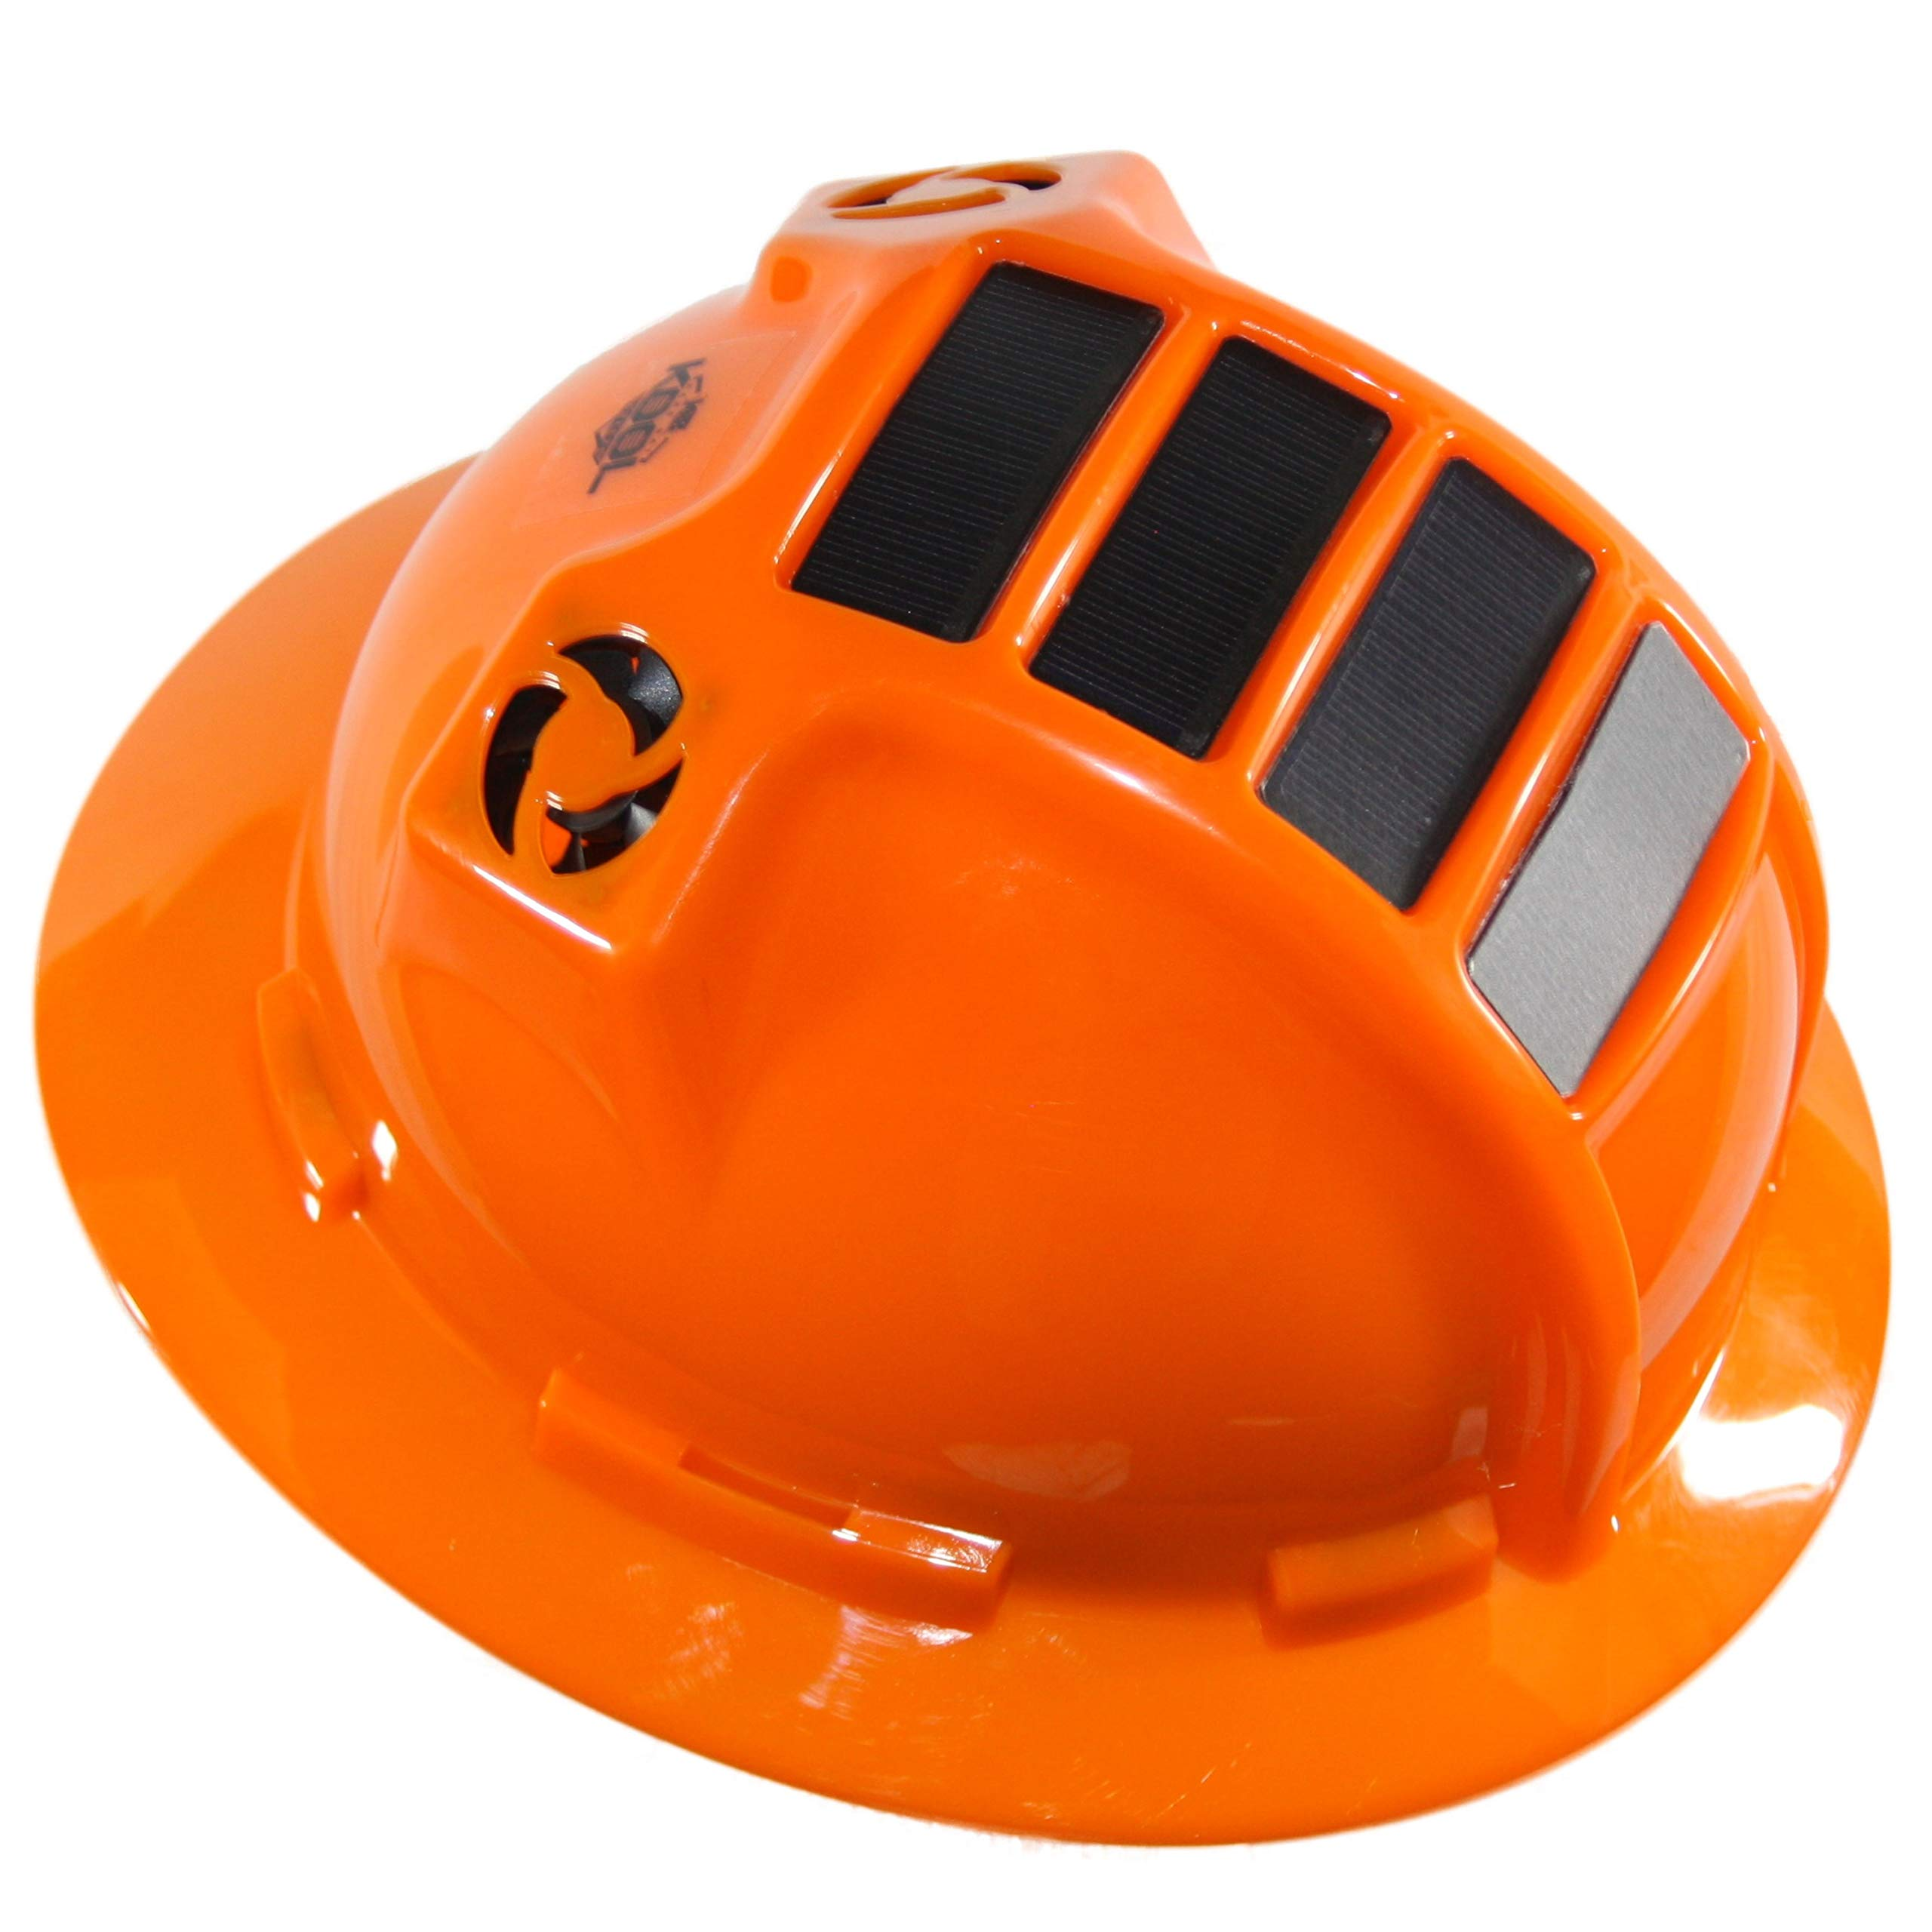 Hard Hat Head Protection Kool Breeze Solar Helmet With Rechargeable Battery and Adjustable Ratchet Suspension (Orange) by Kool Breeze Solar Hats (Image #3)